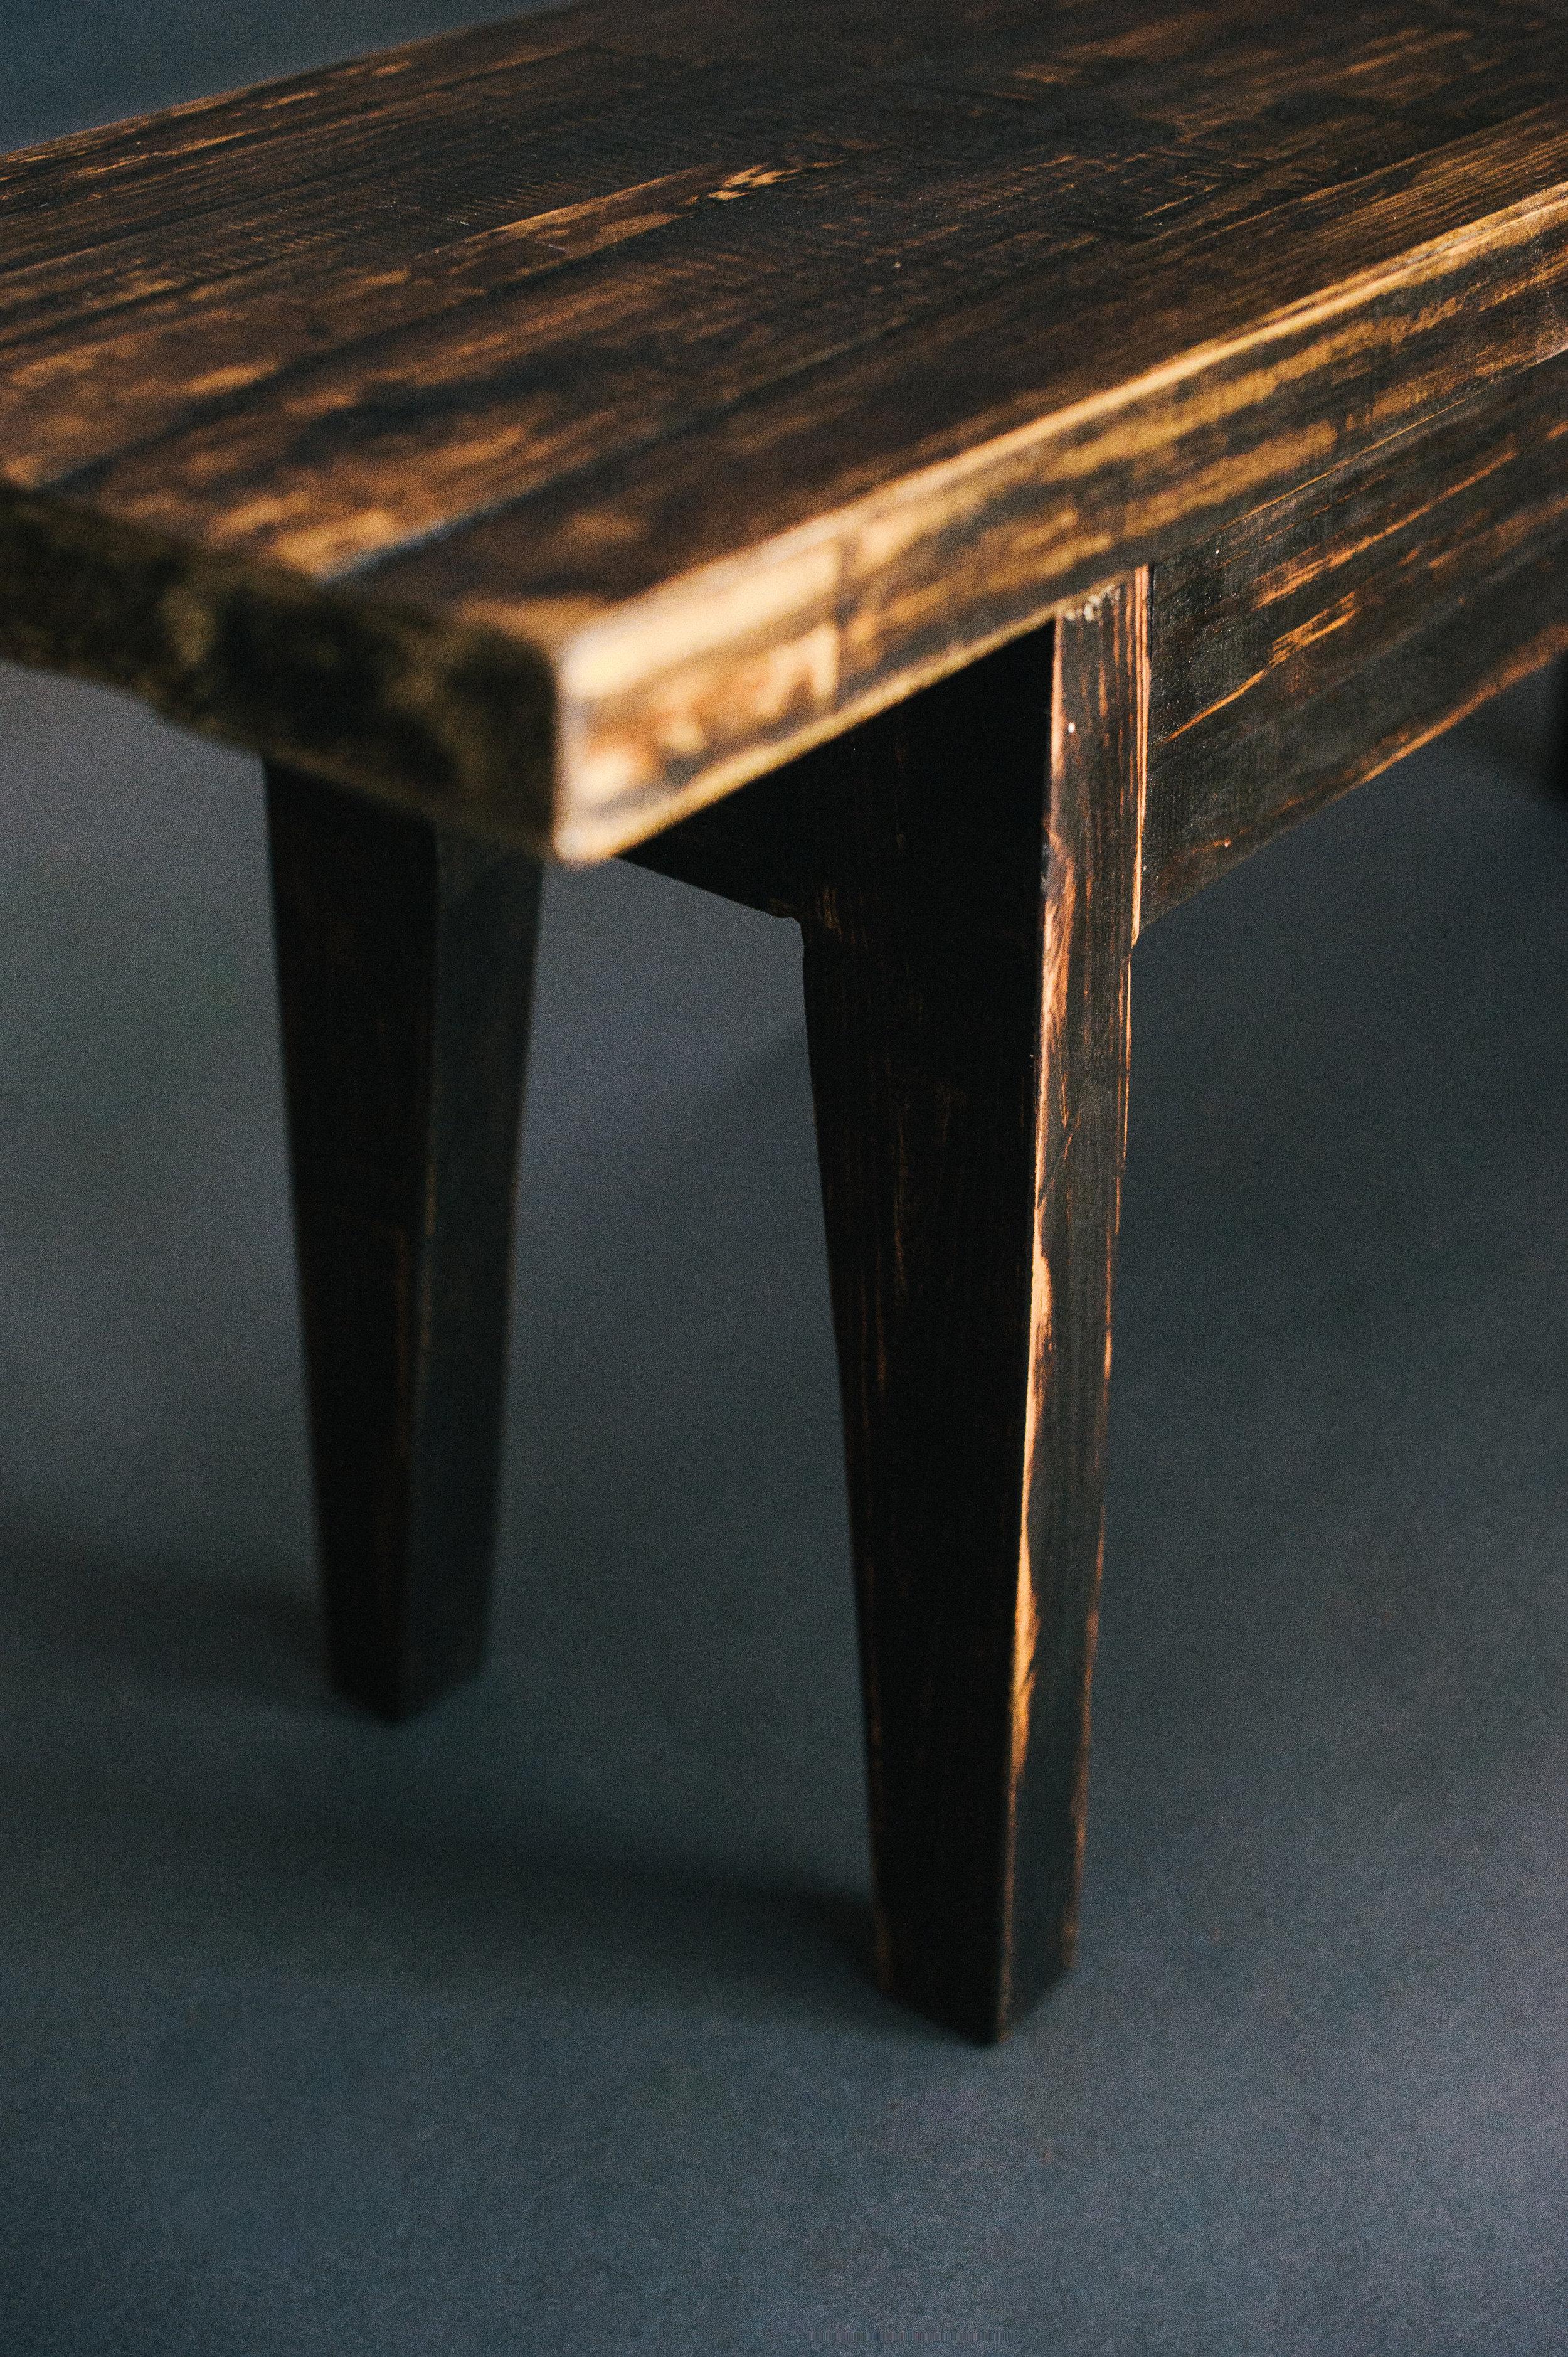 DSC_2008-THE2654PROJECT-Carpentry.jpg